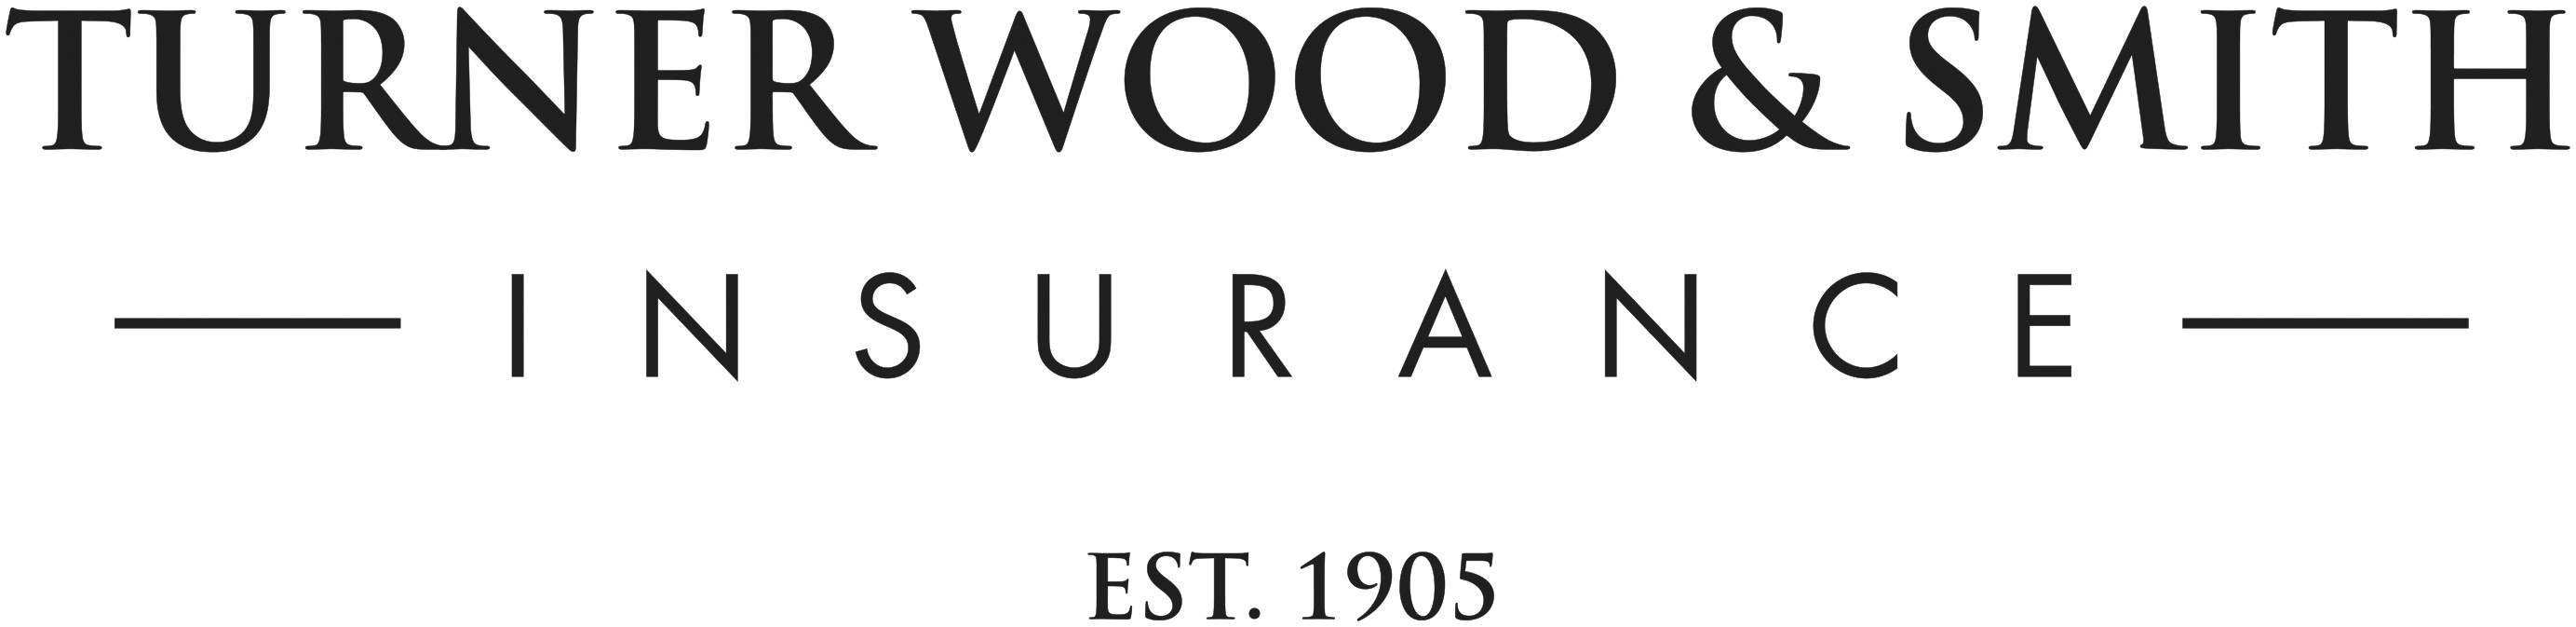 Turner Wood & Smith